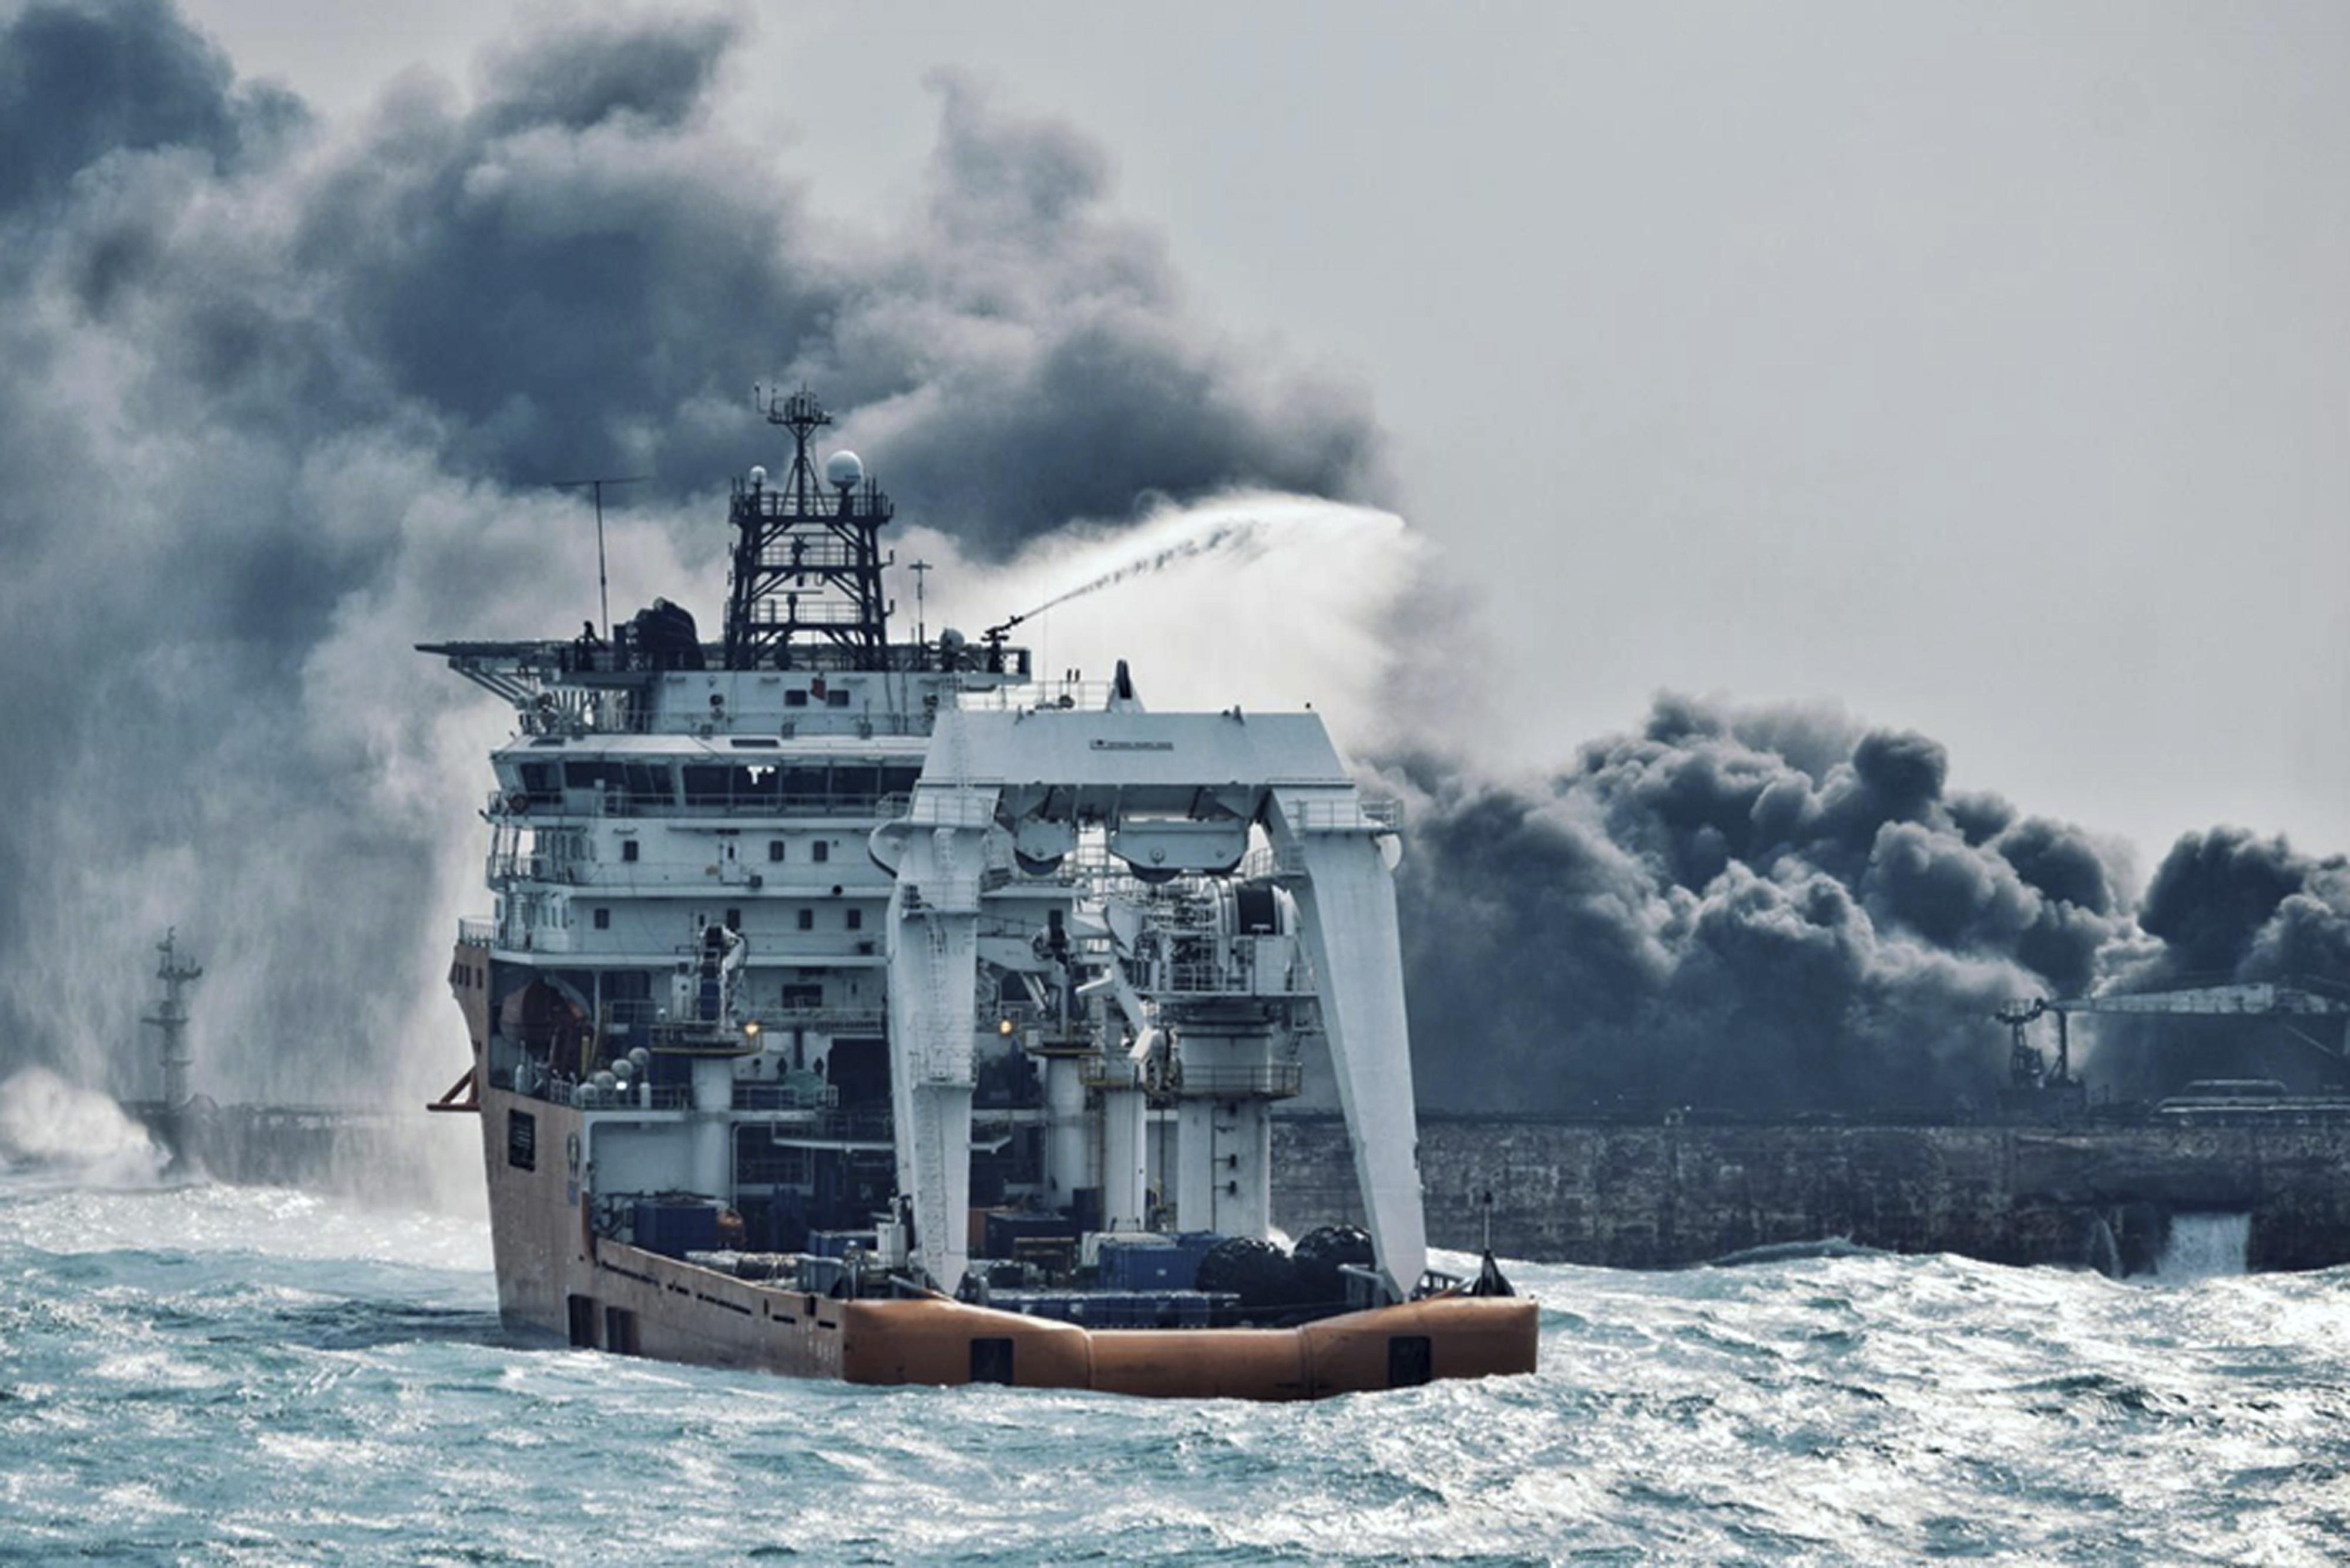 Affondata la petroliera Sanchi, allarme disastro ambientale